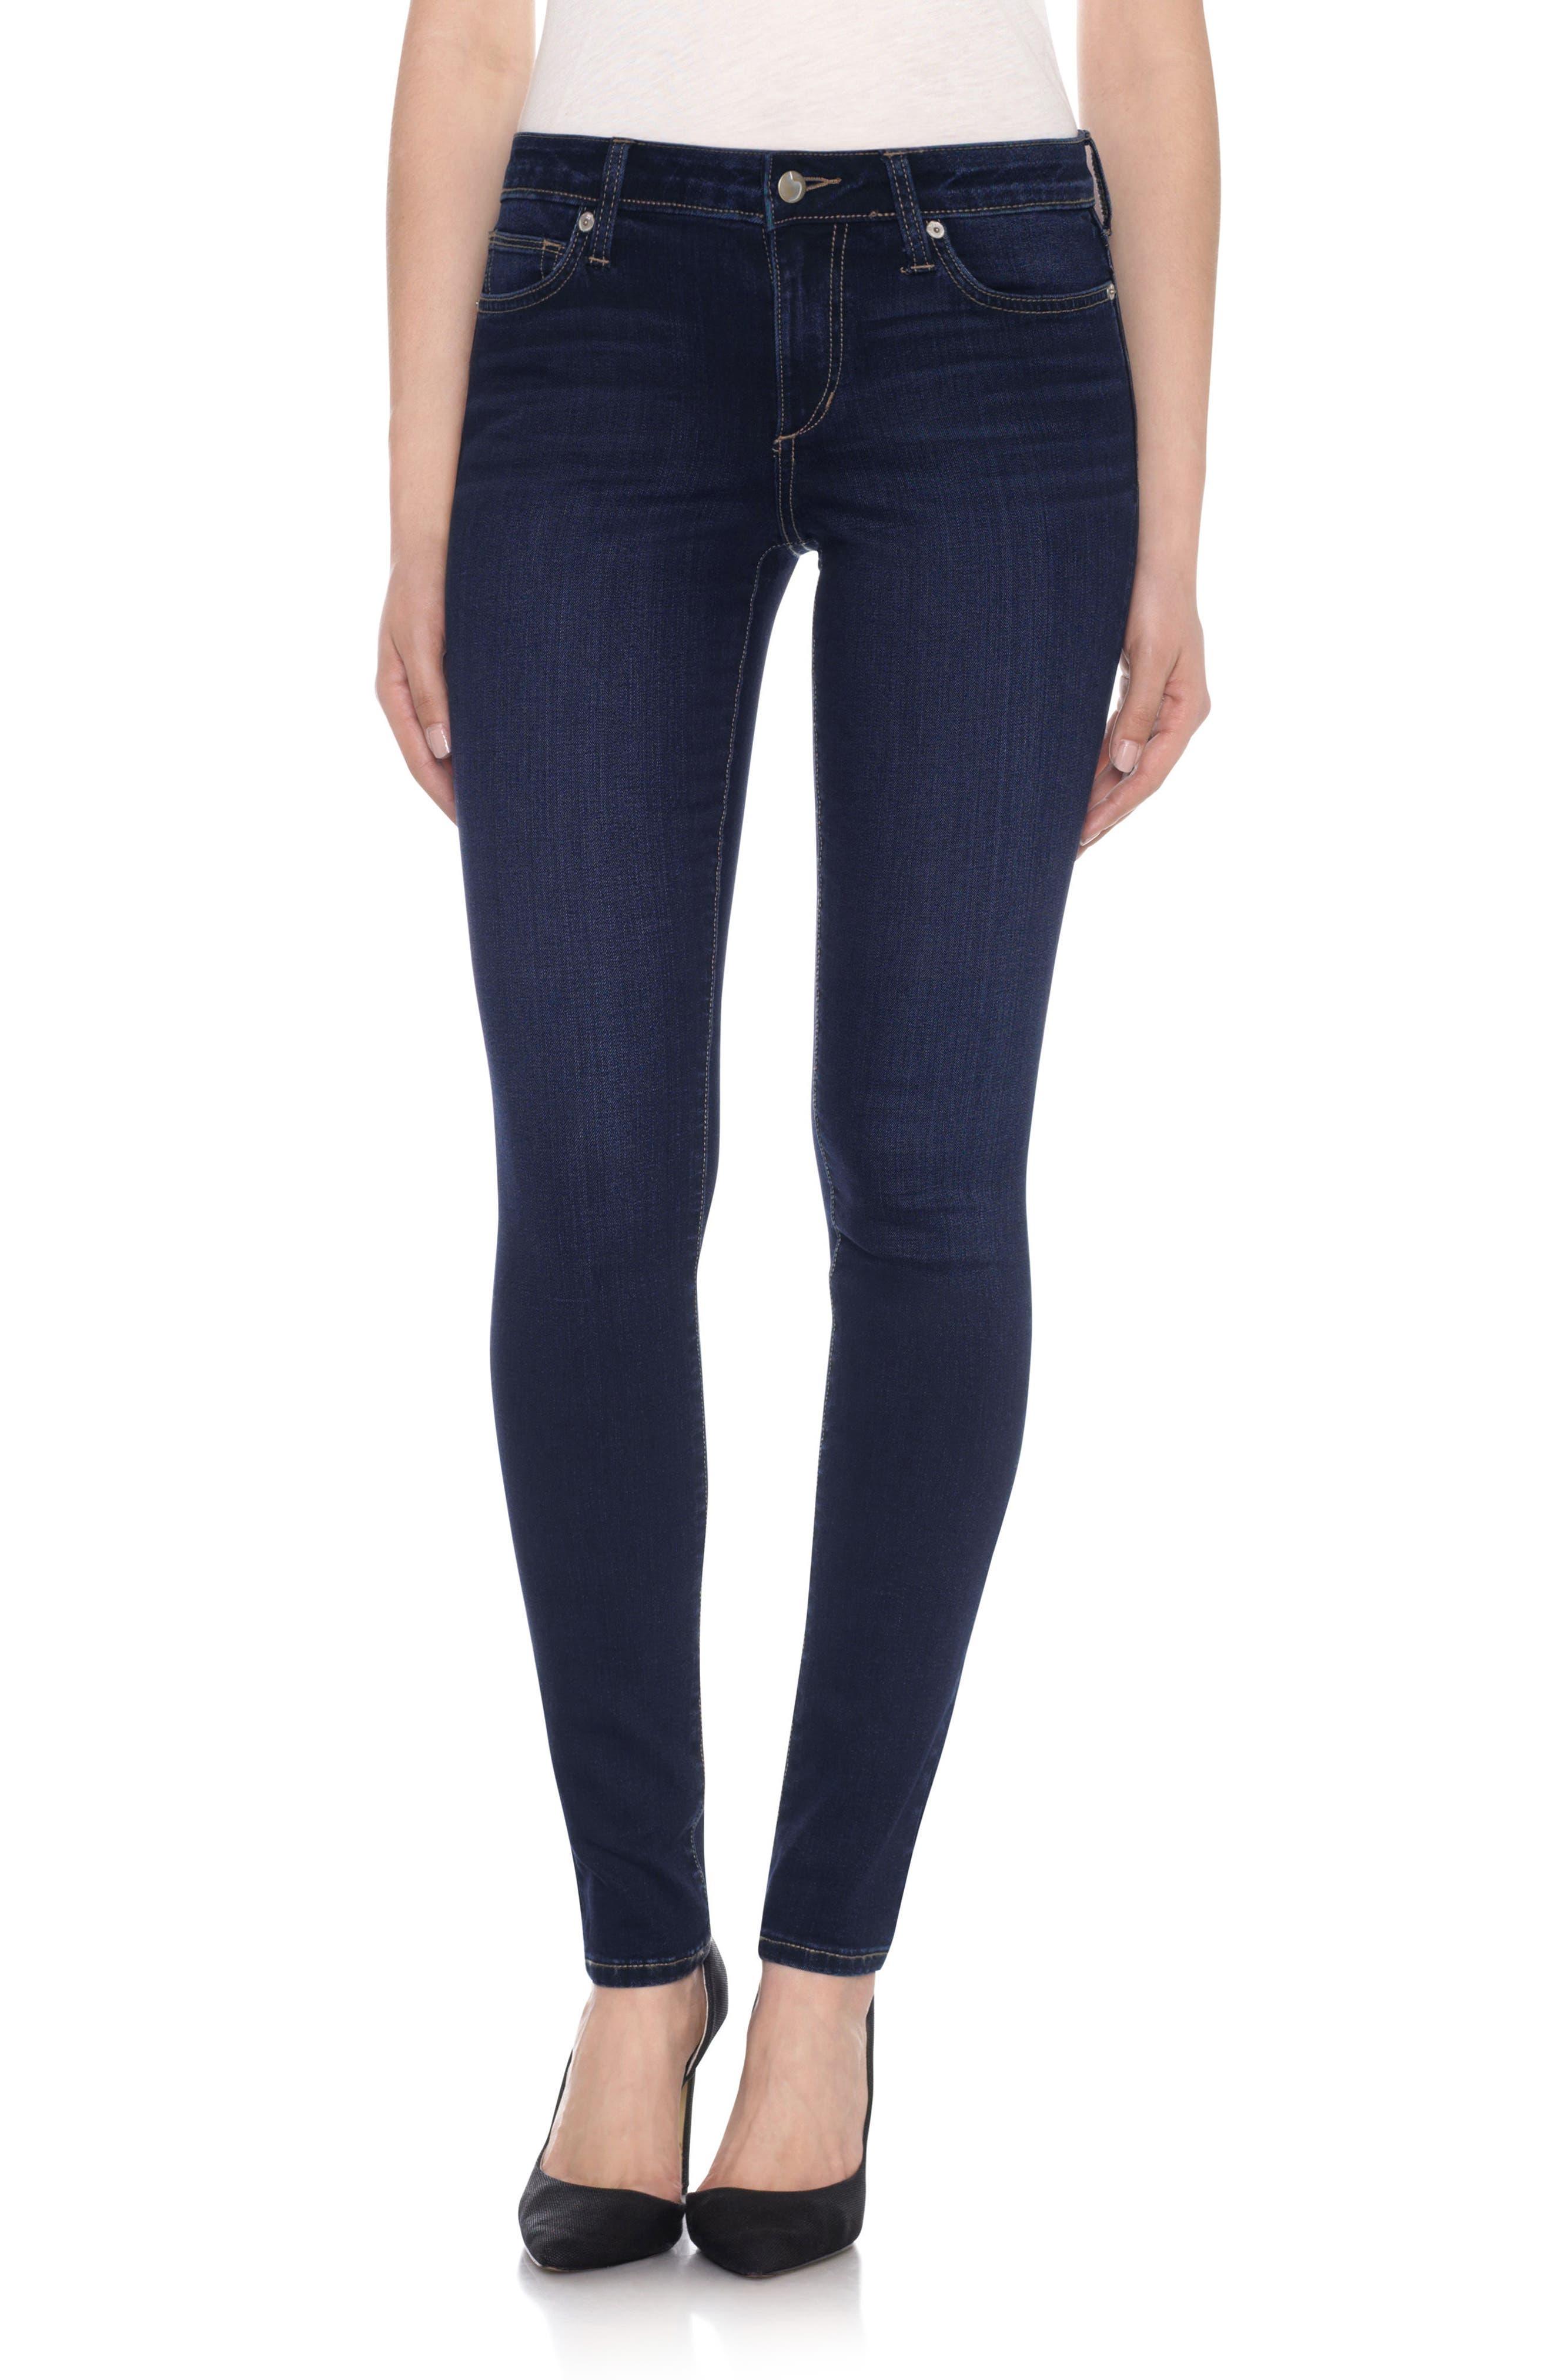 Honey Curvy Skinny Jeans,                         Main,                         color, Suzen